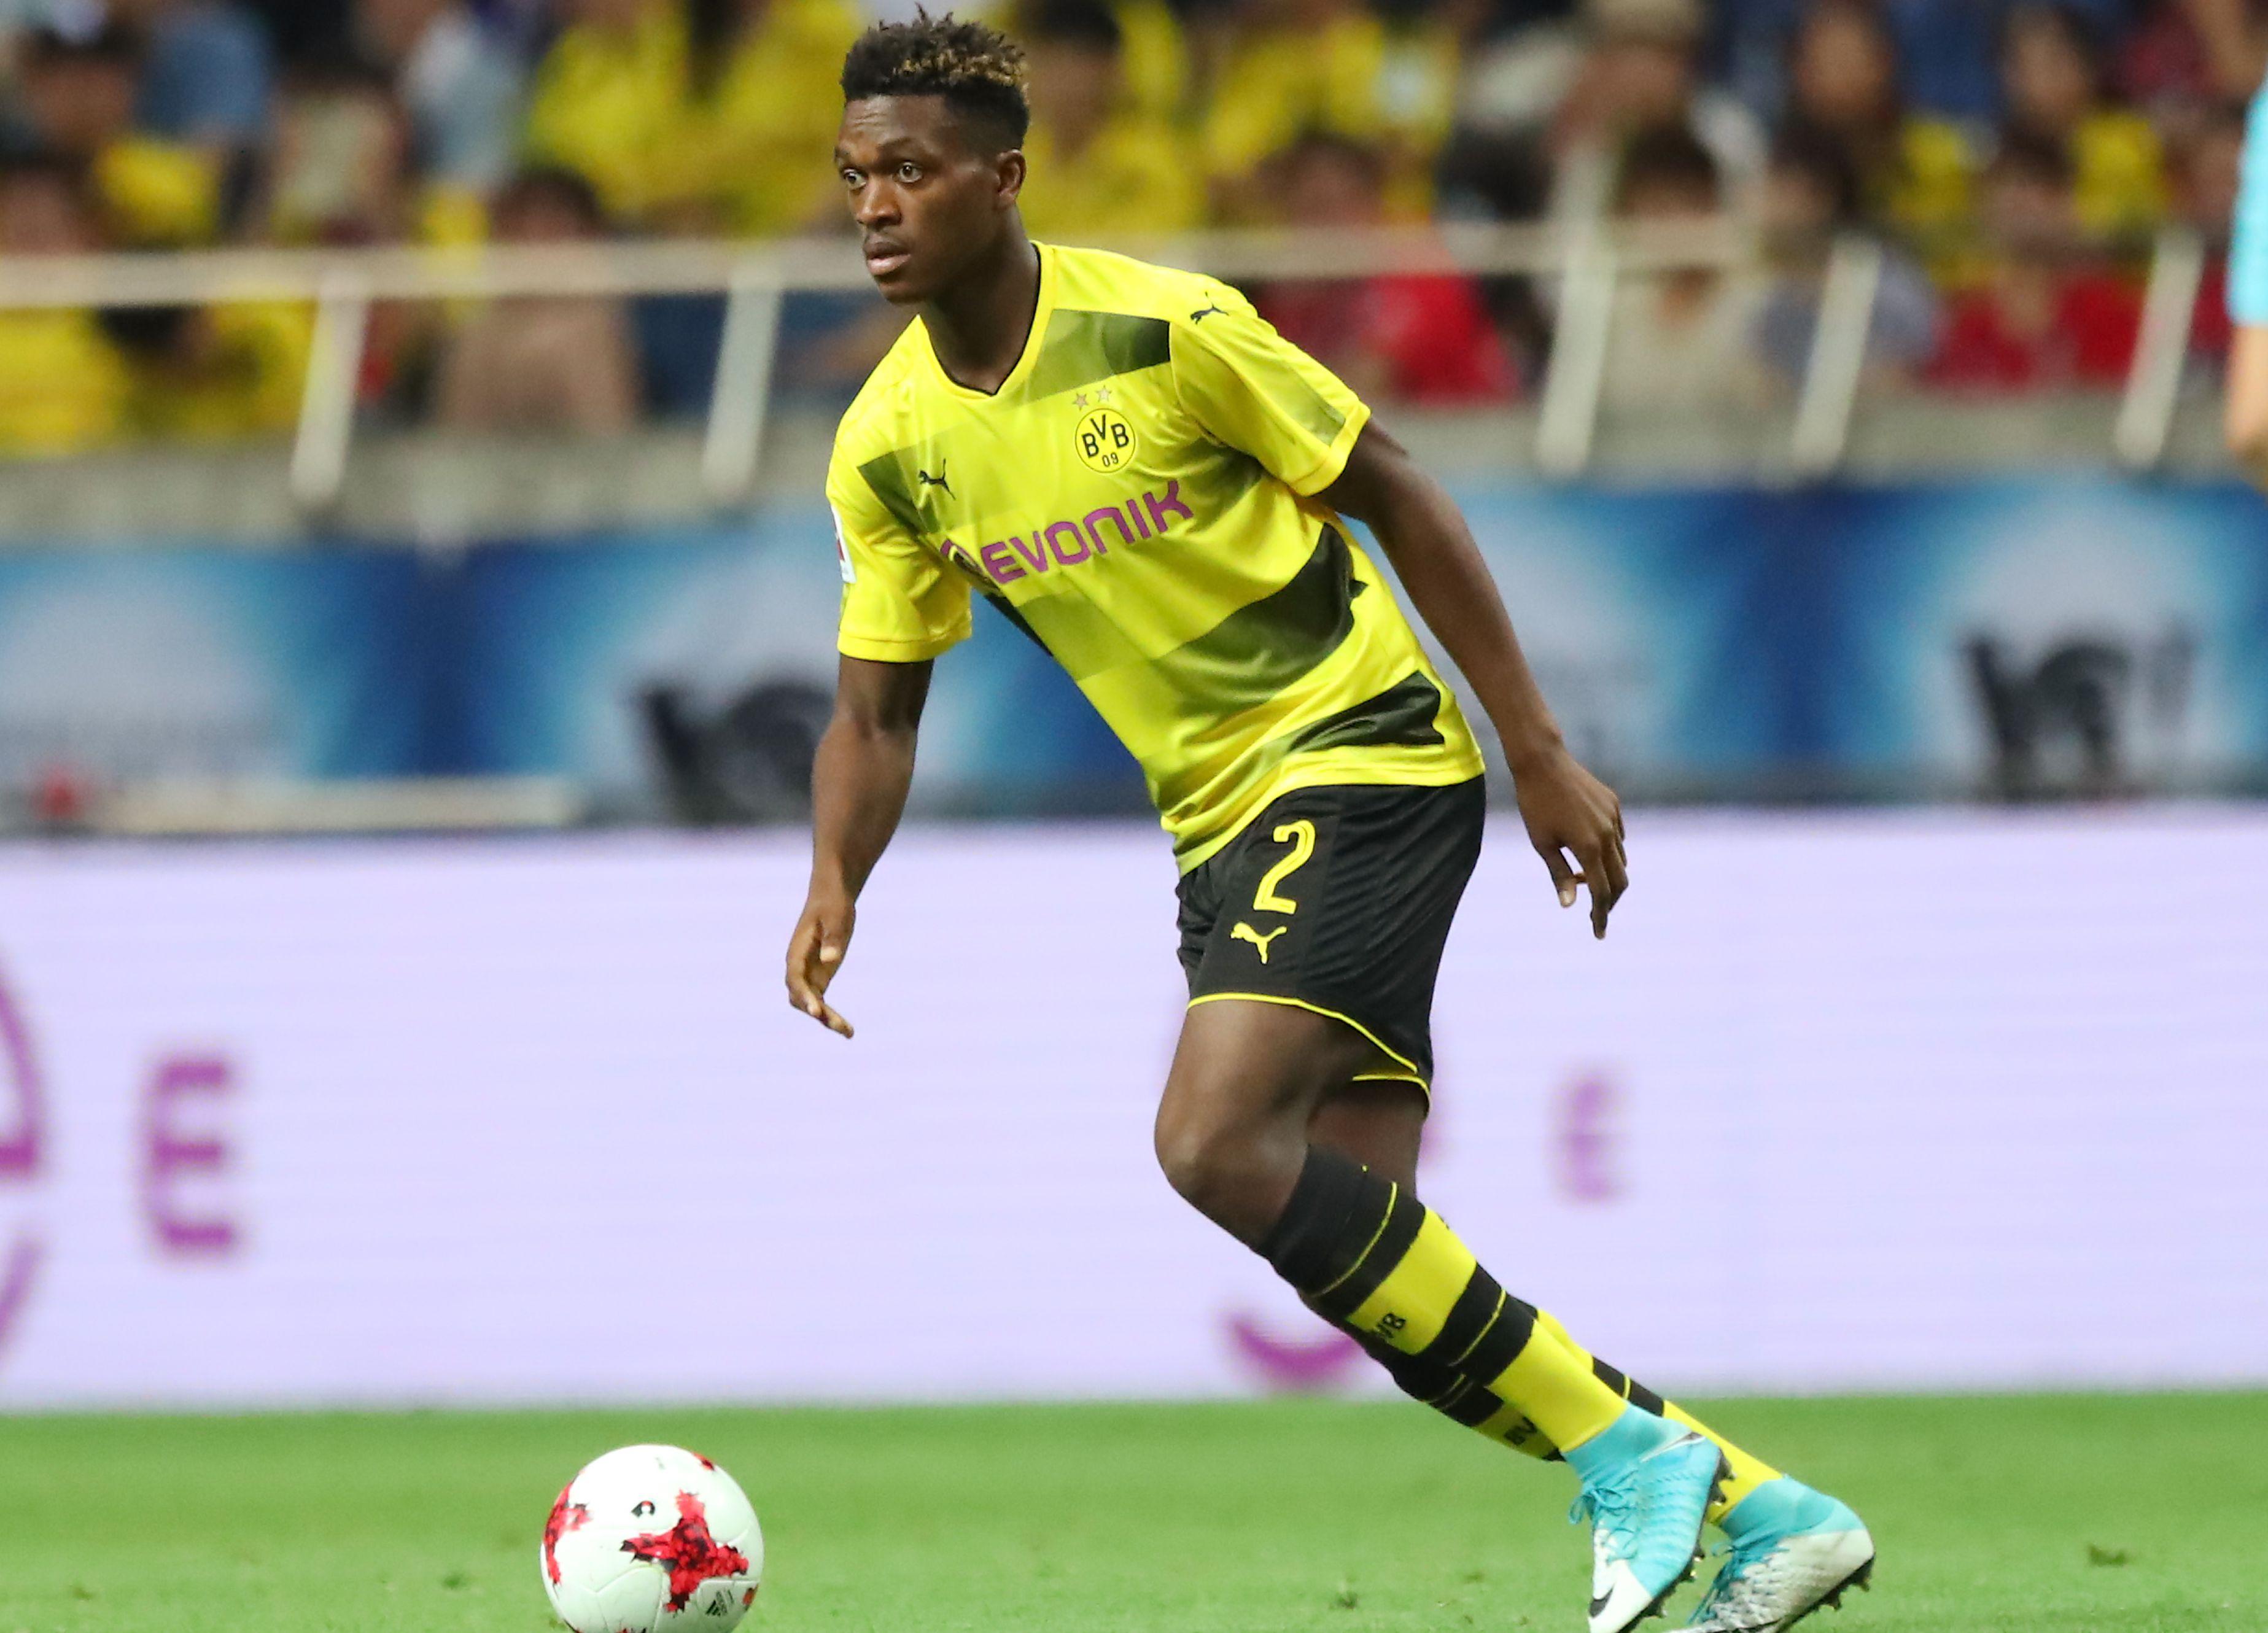 Maillot Extérieur Borussia Dortmund Dan-Axel Zagadou